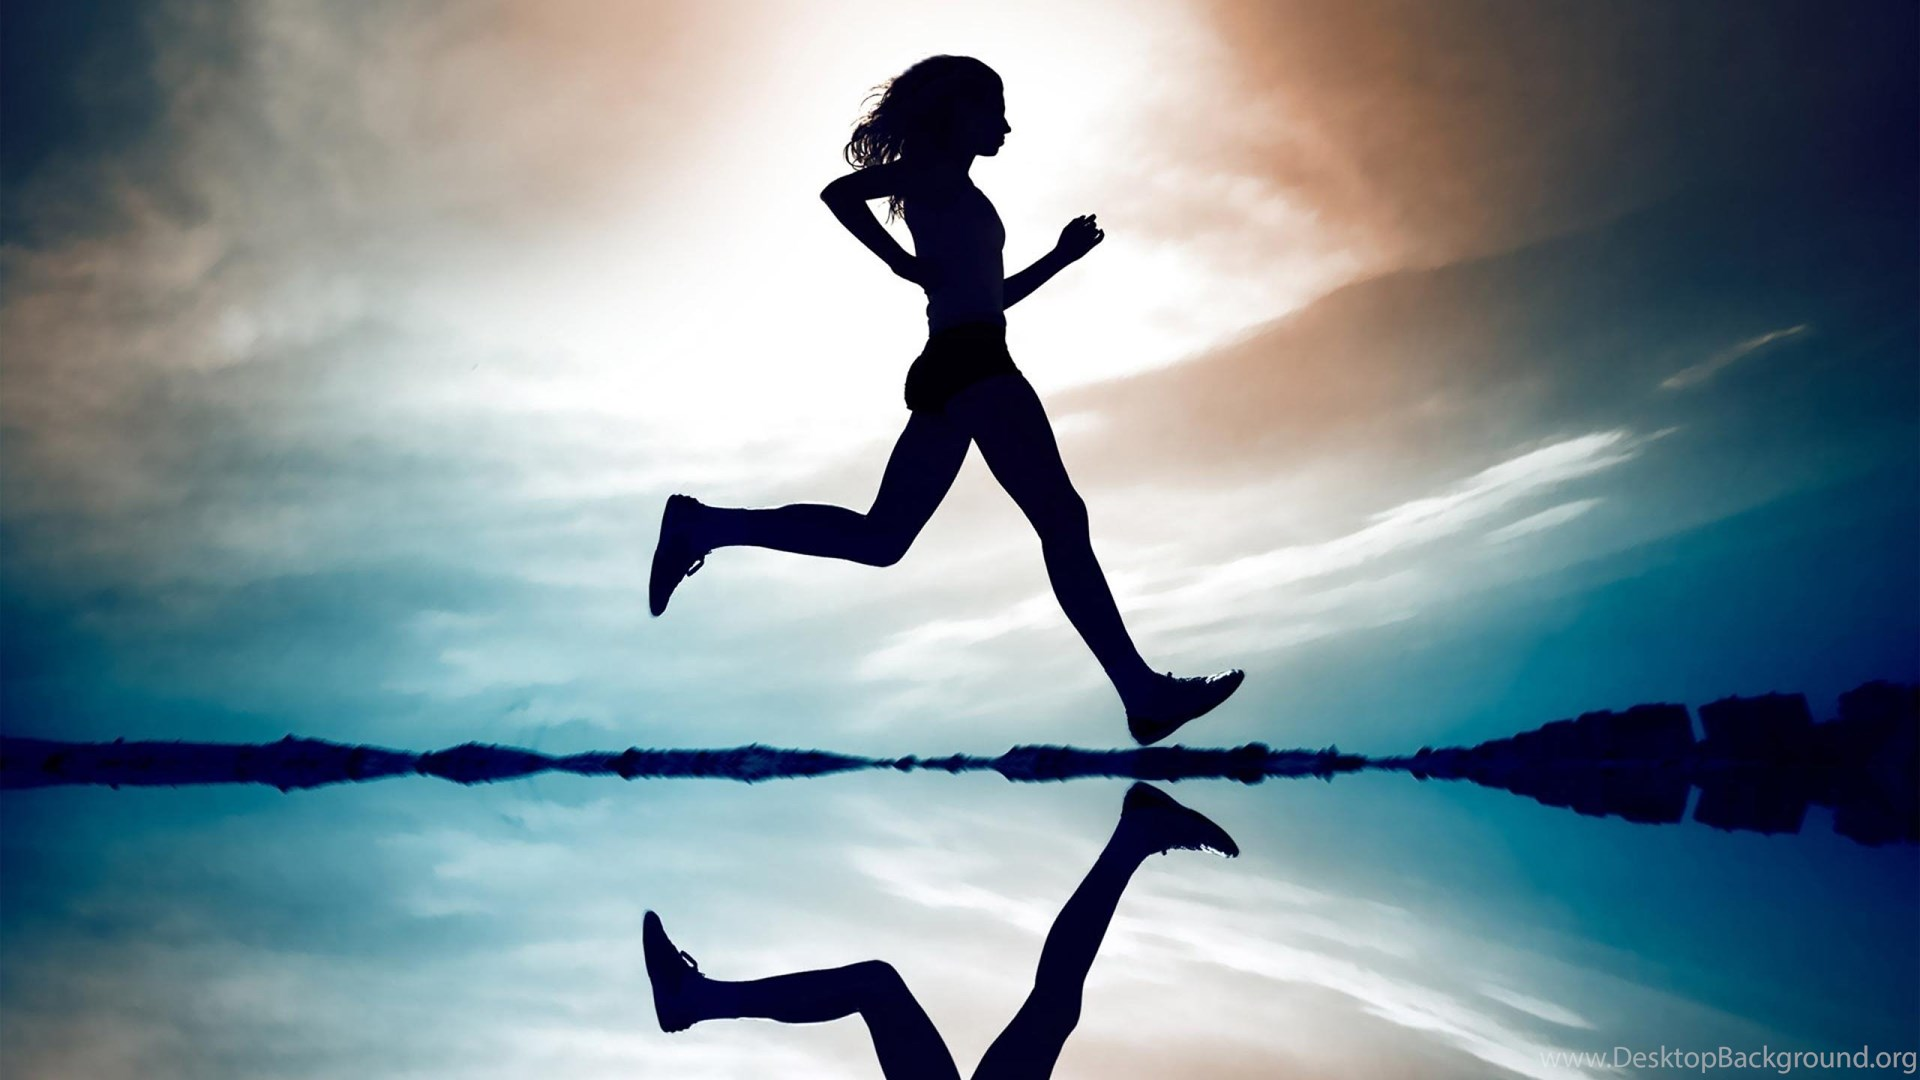 1920x1080 Wallpapers Sports Girls Girl Silhouette Jog Reflection Running